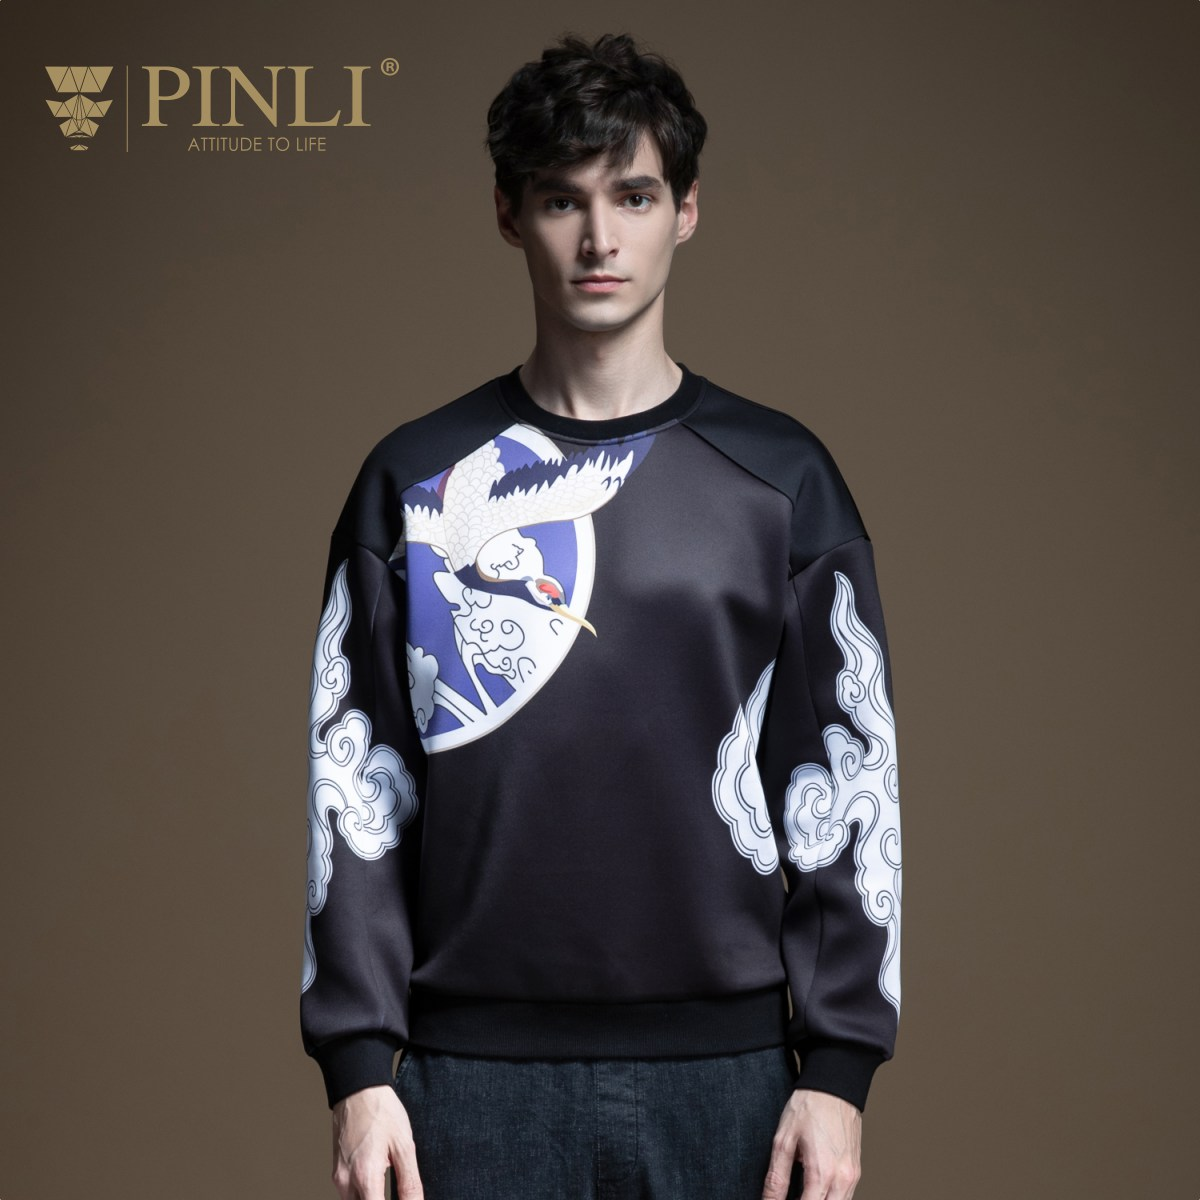 PINLI 2020 xuân mới nam cổ tròn quốc triều in áo thun áo len B201209030 - Áo len